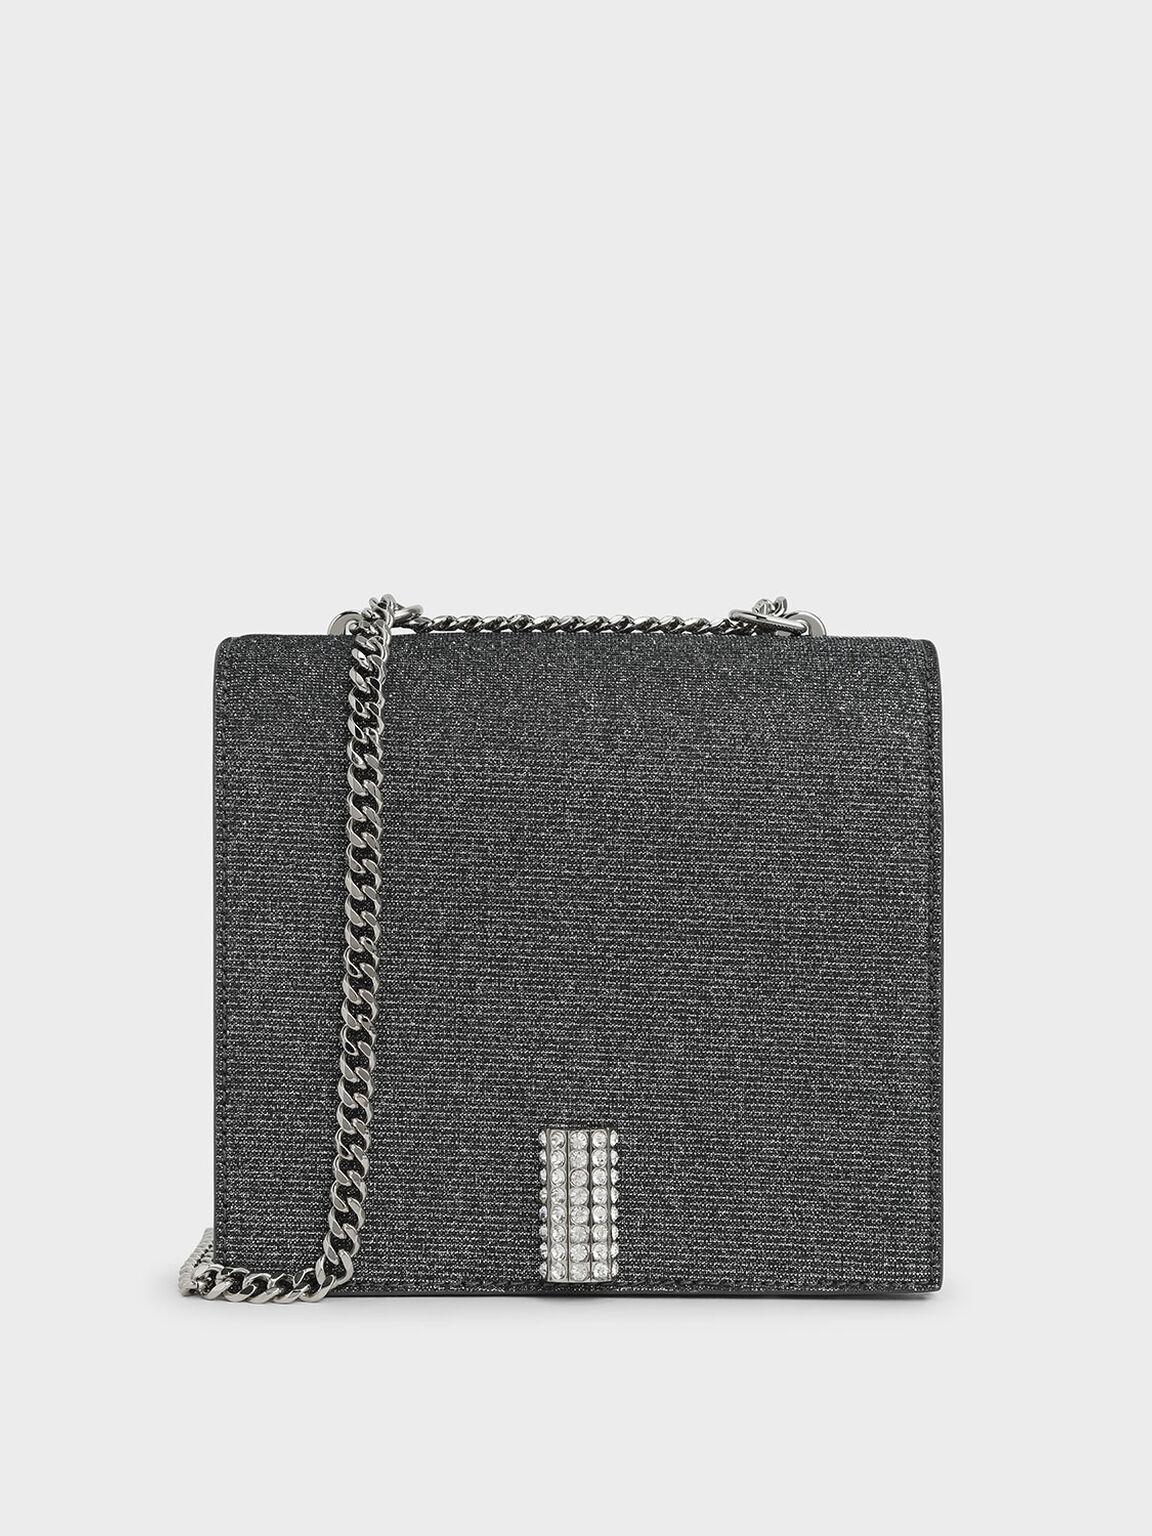 Glittered Square Crossbody Bag, Silver, hi-res